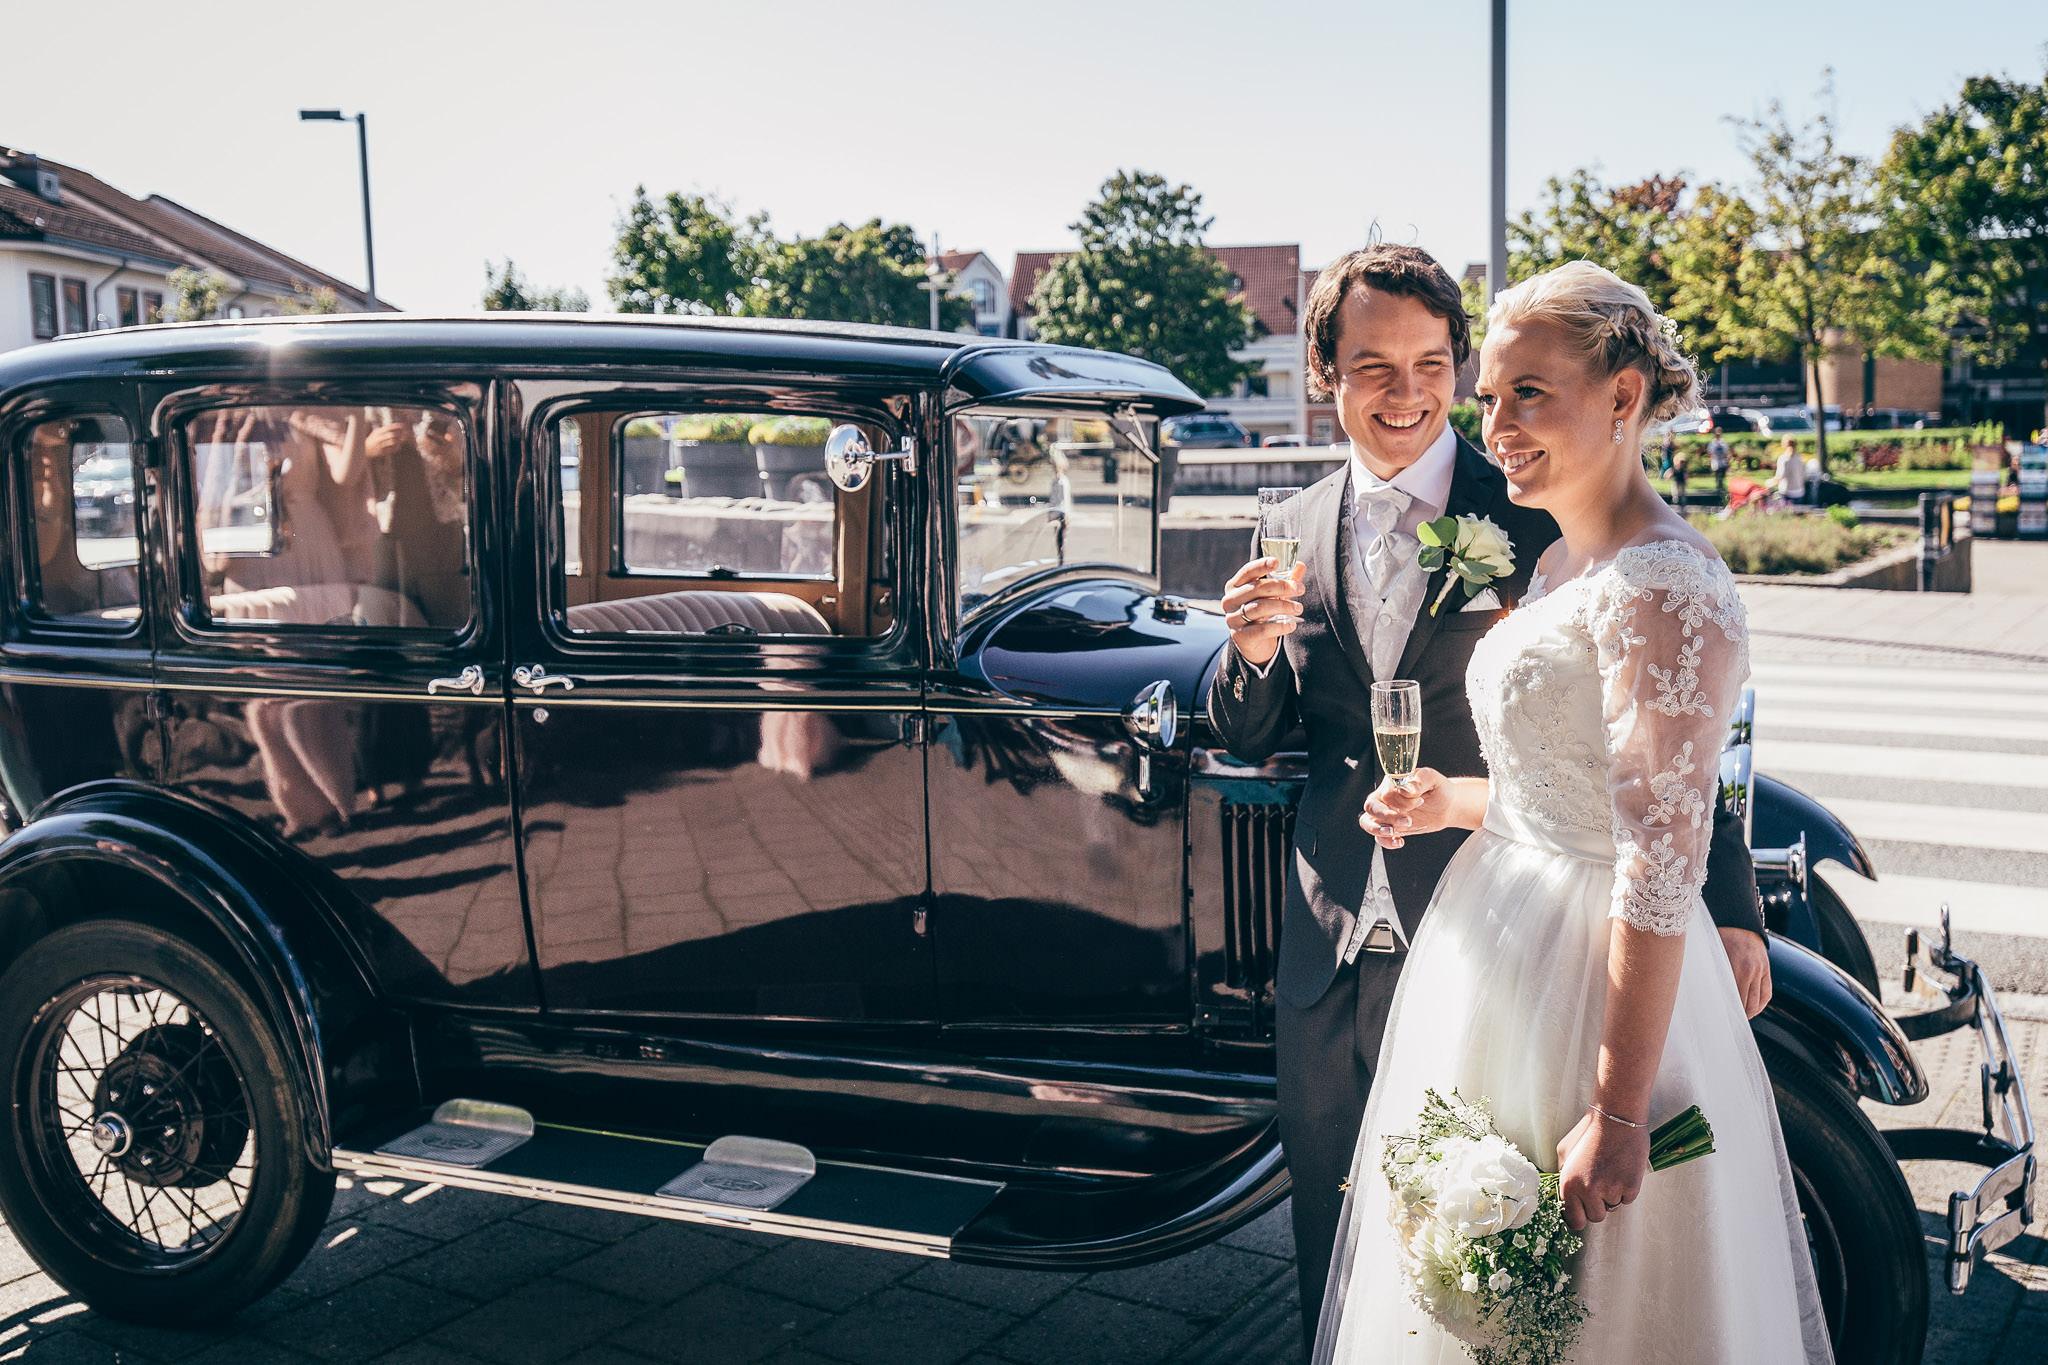 Wedding+Photographer+Norway+Bryllupsfotograf+Casey+Arneson+JT-77.jpg